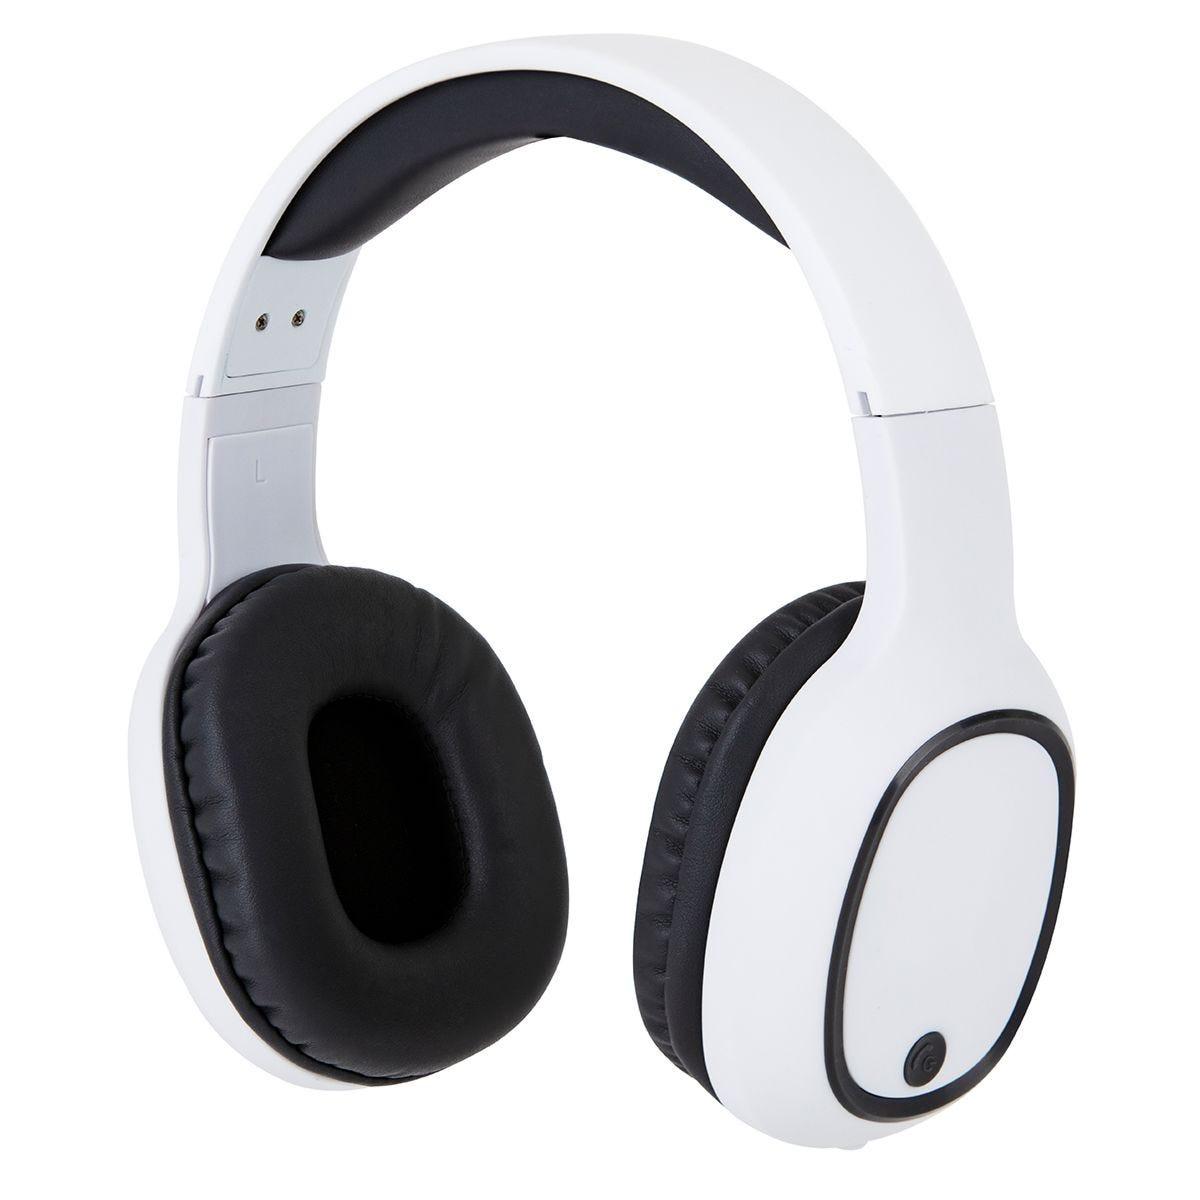 Itek Bluetooth Headphones - White